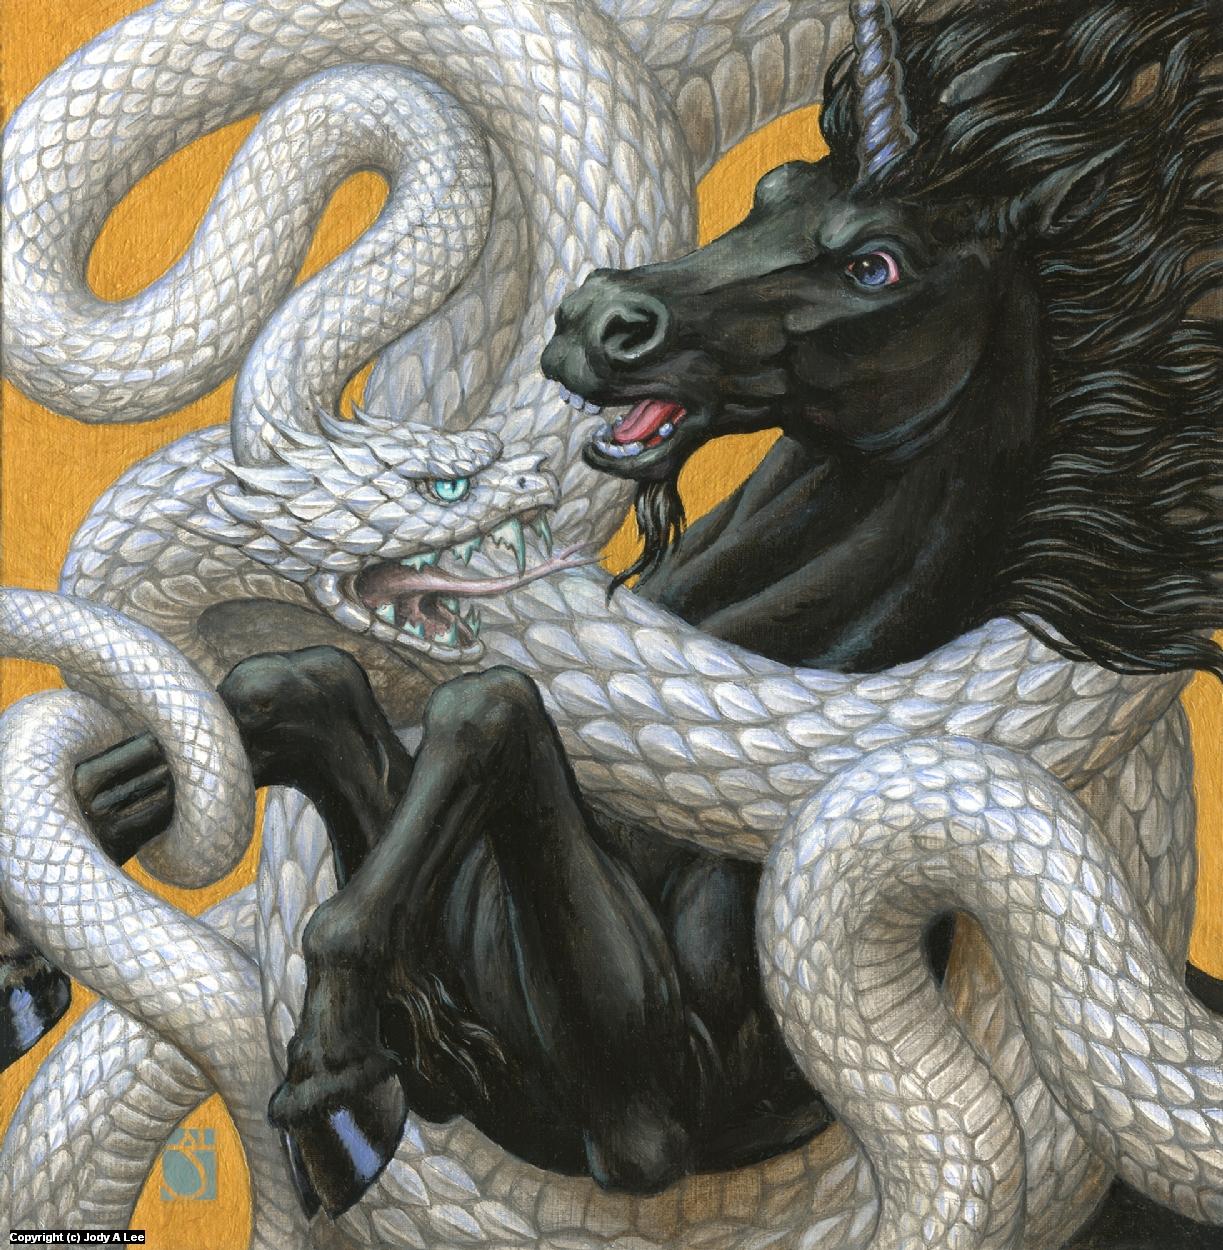 Unicorn & Viper Artwork by Jody Lee